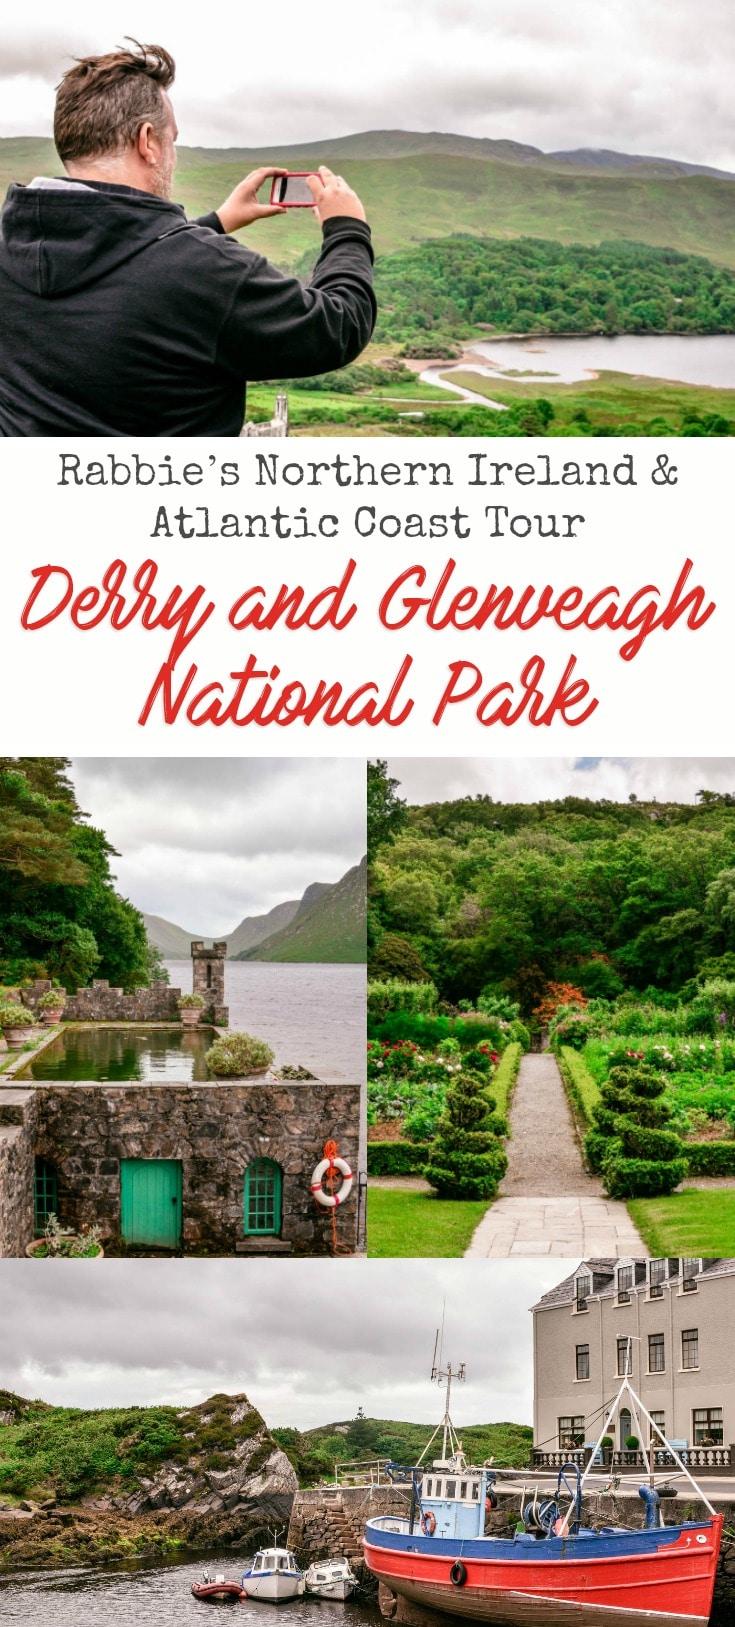 rabbie's Derry and Glenveagh National Park